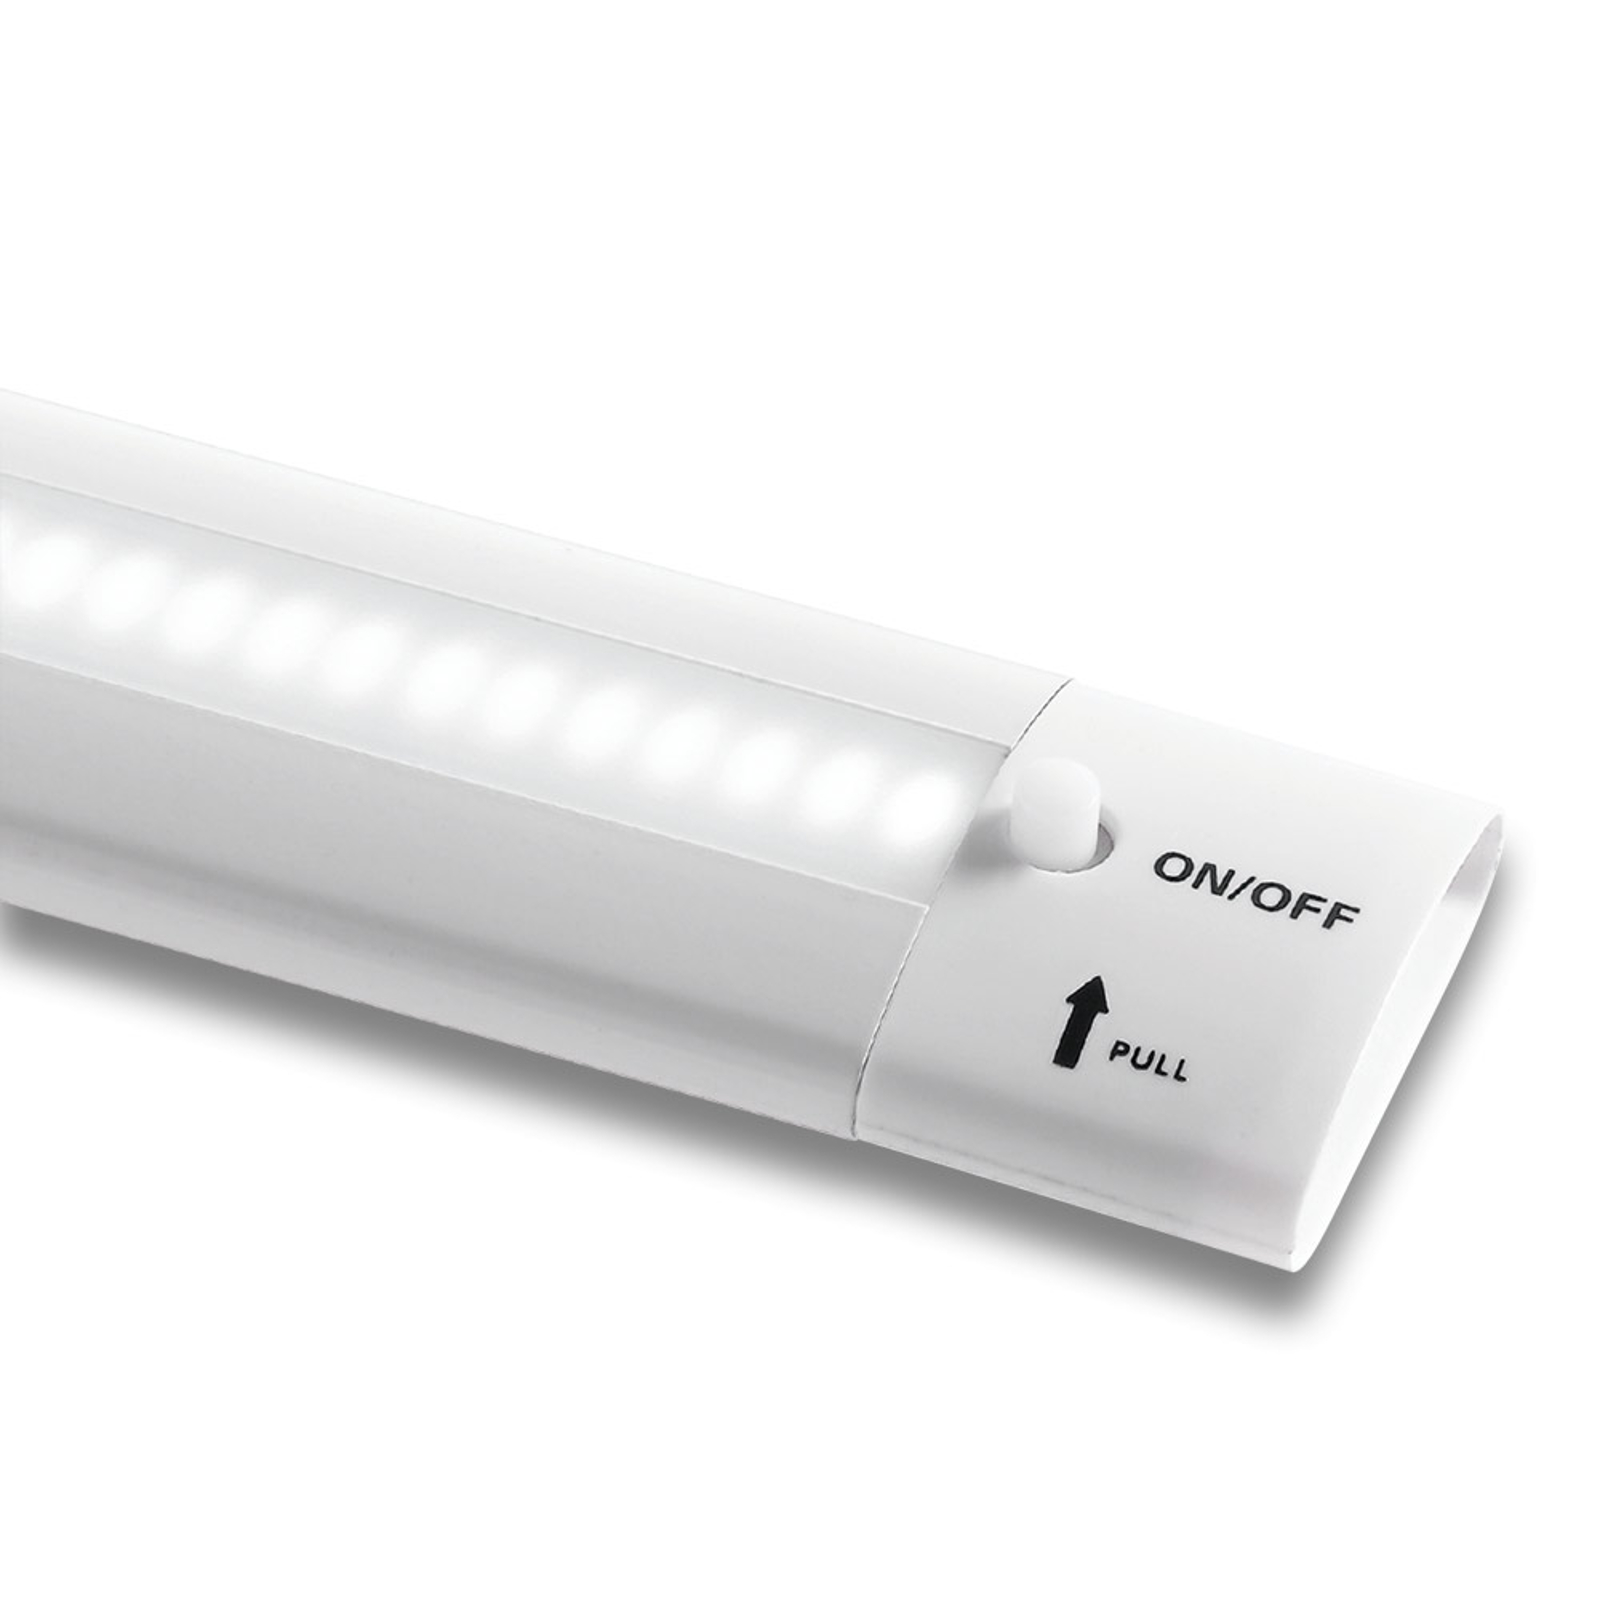 LED 16W møbelbelysning Galway 6690 hvit